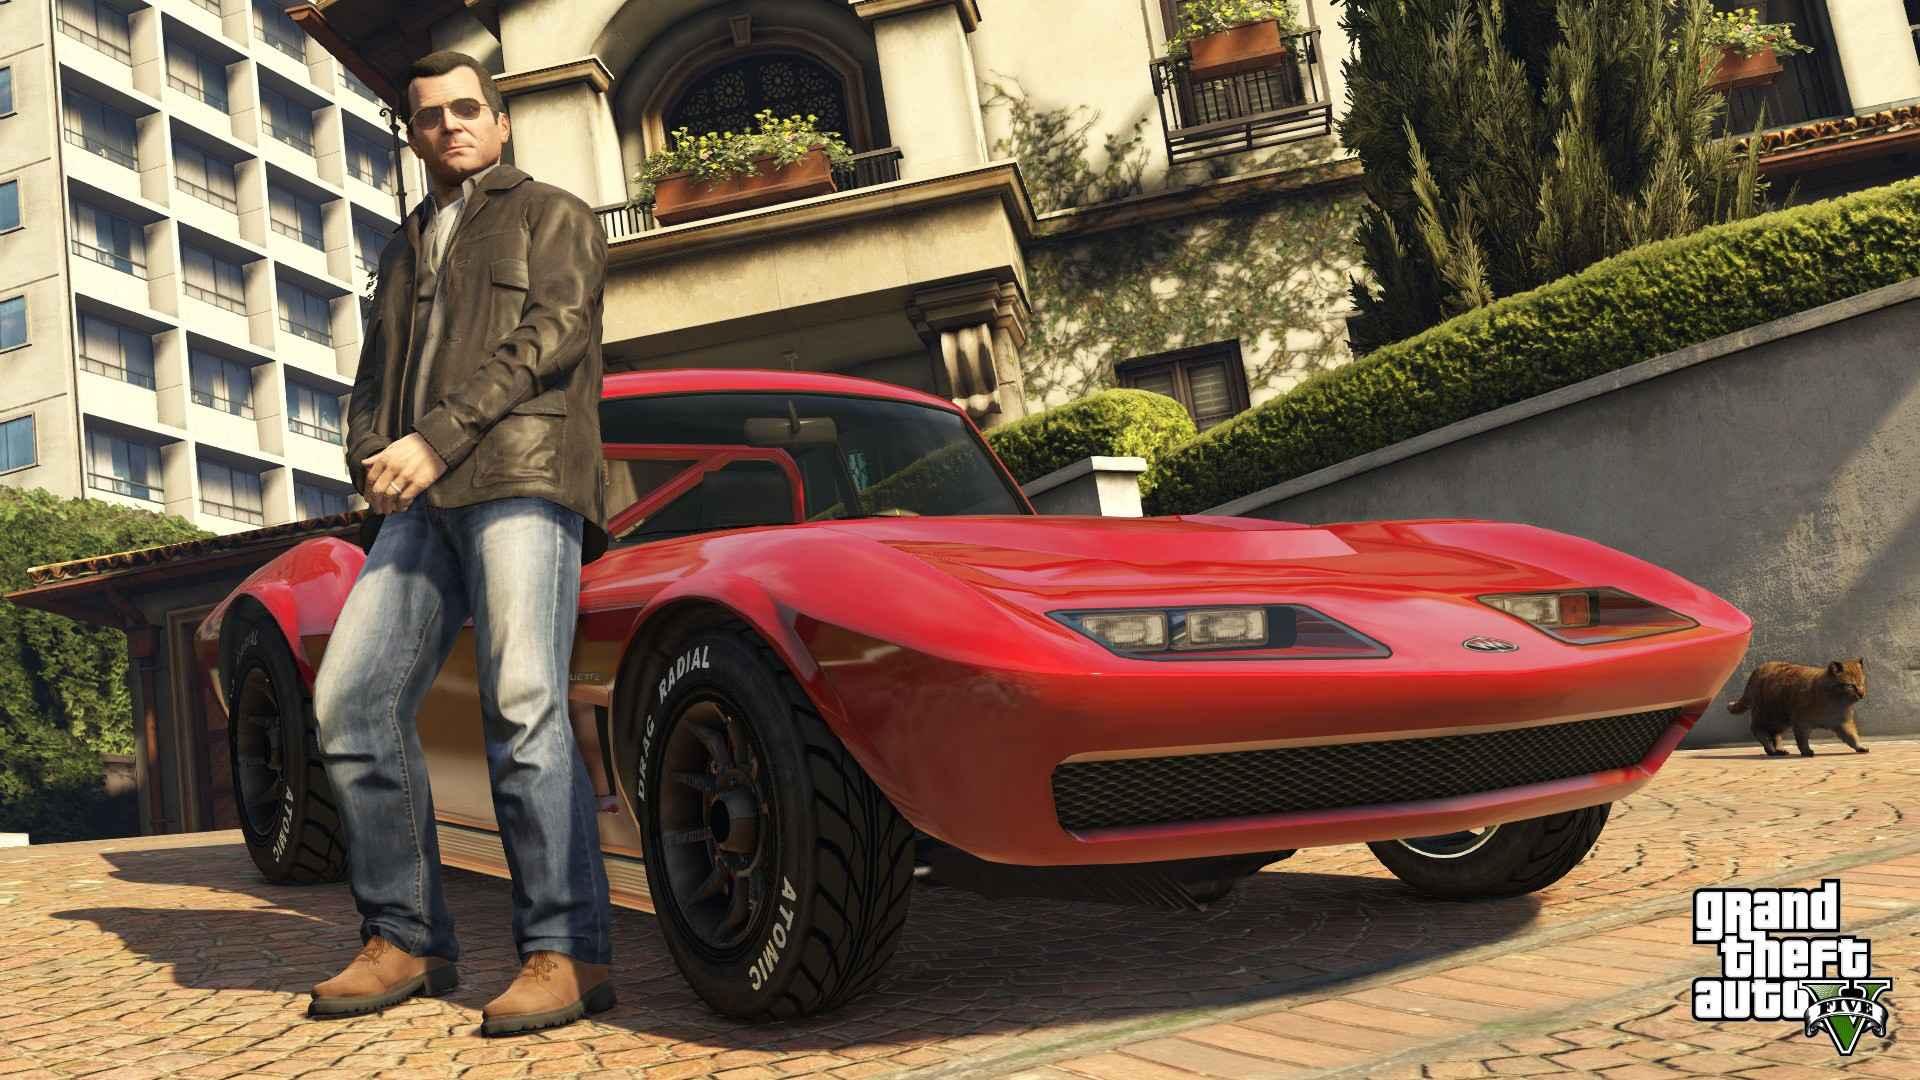 Game Grand Theft Auto V Wallpaper 051